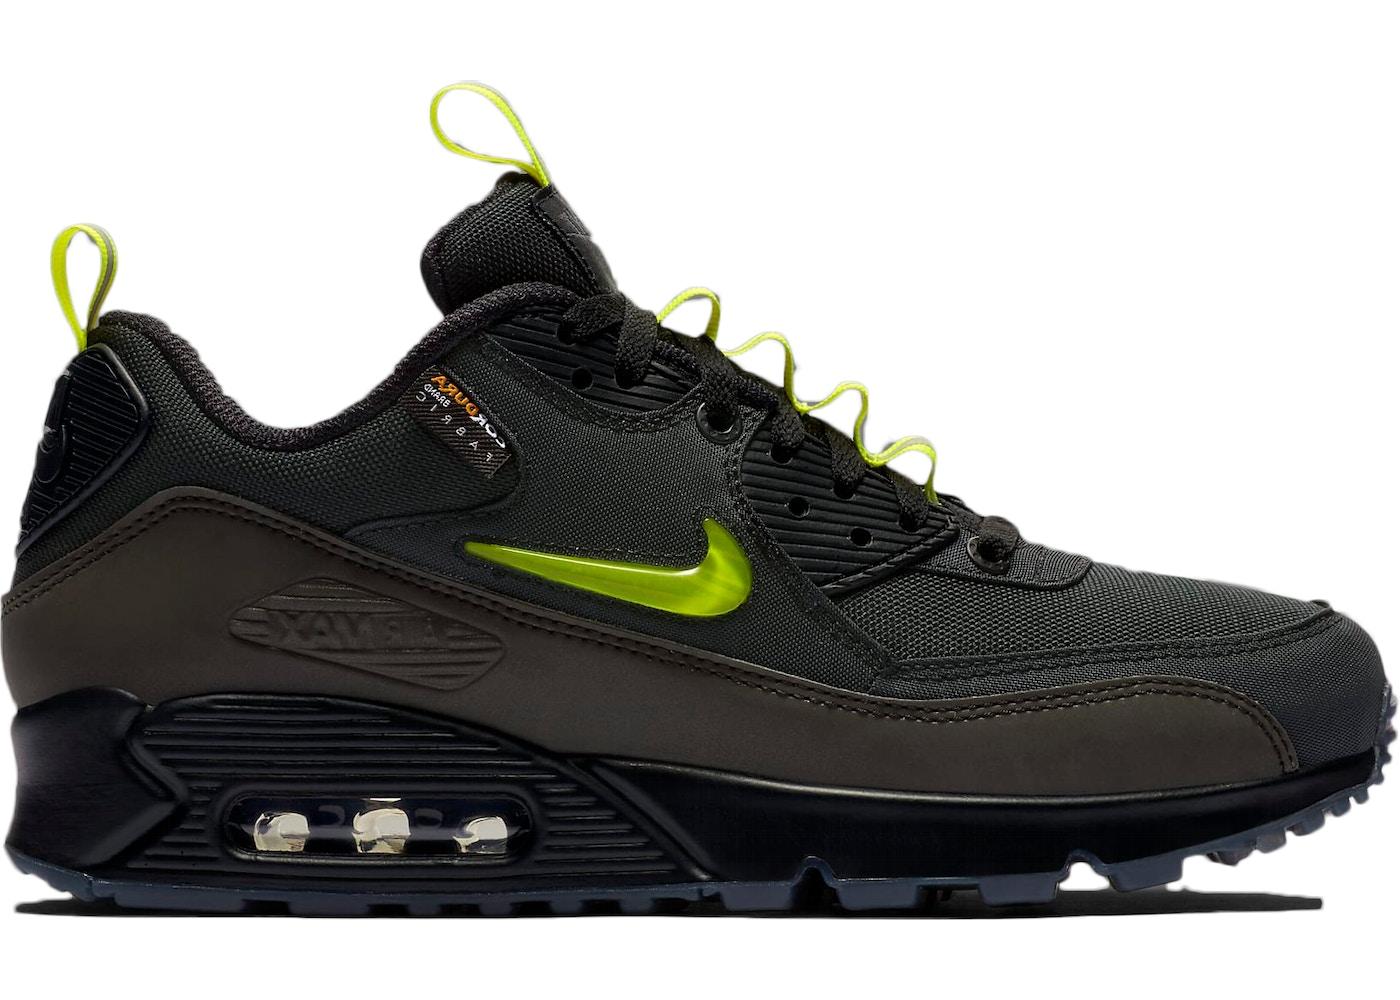 Air Max 90 Leather Men's Shoes Black Dark Blue Sale & Get